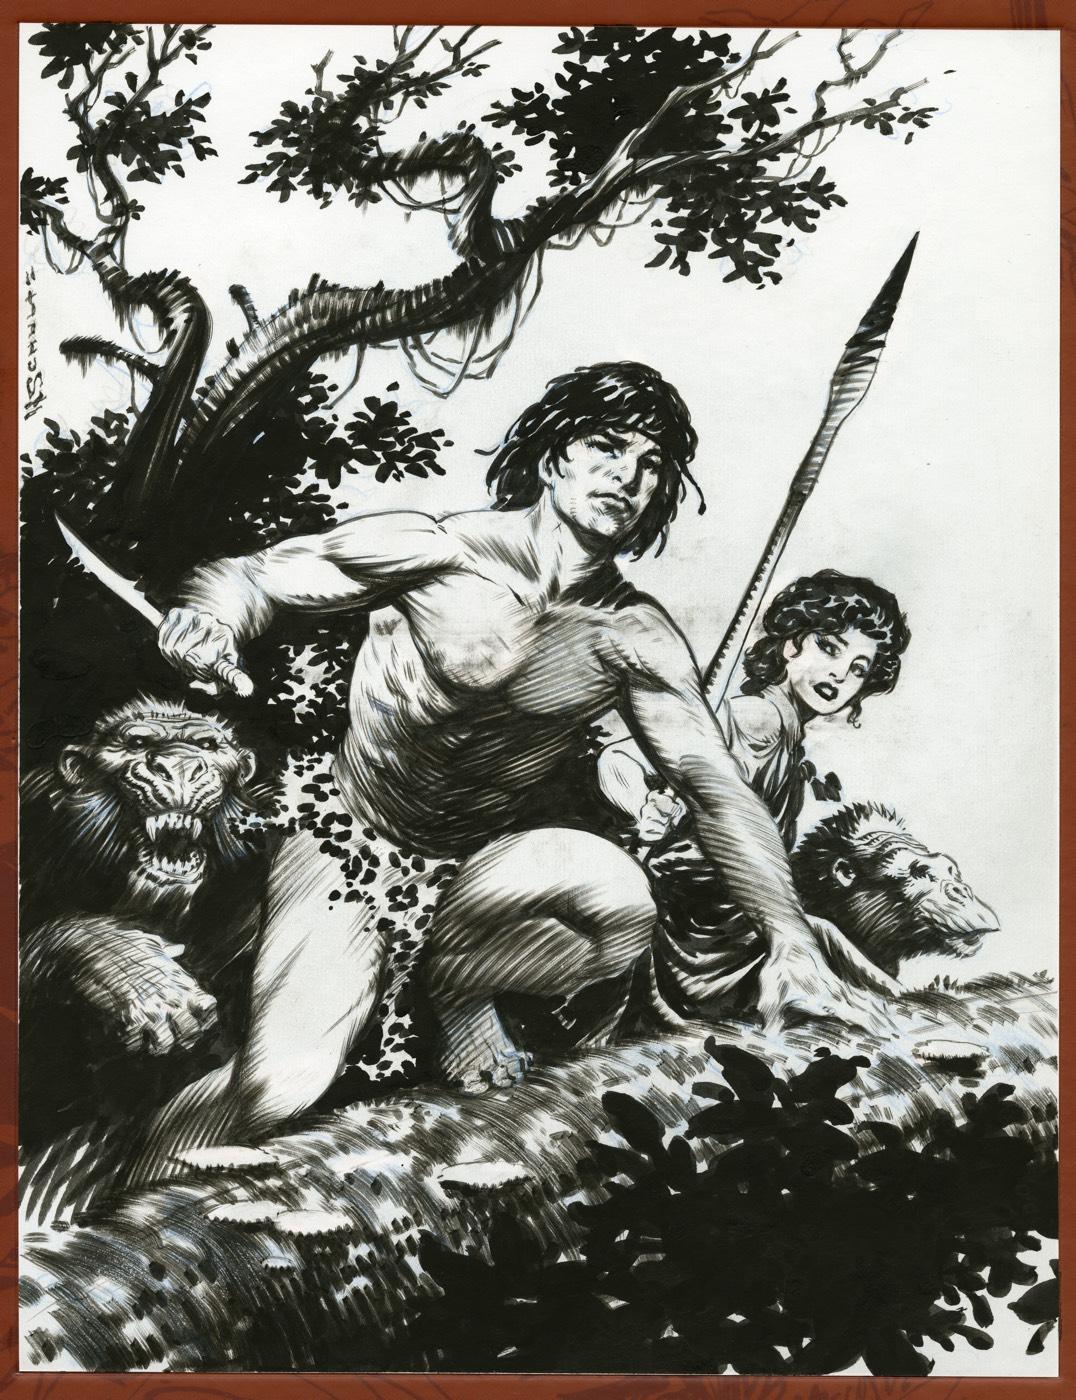 Popolare ERBzine 5682: Kubert's Tarzan MS53